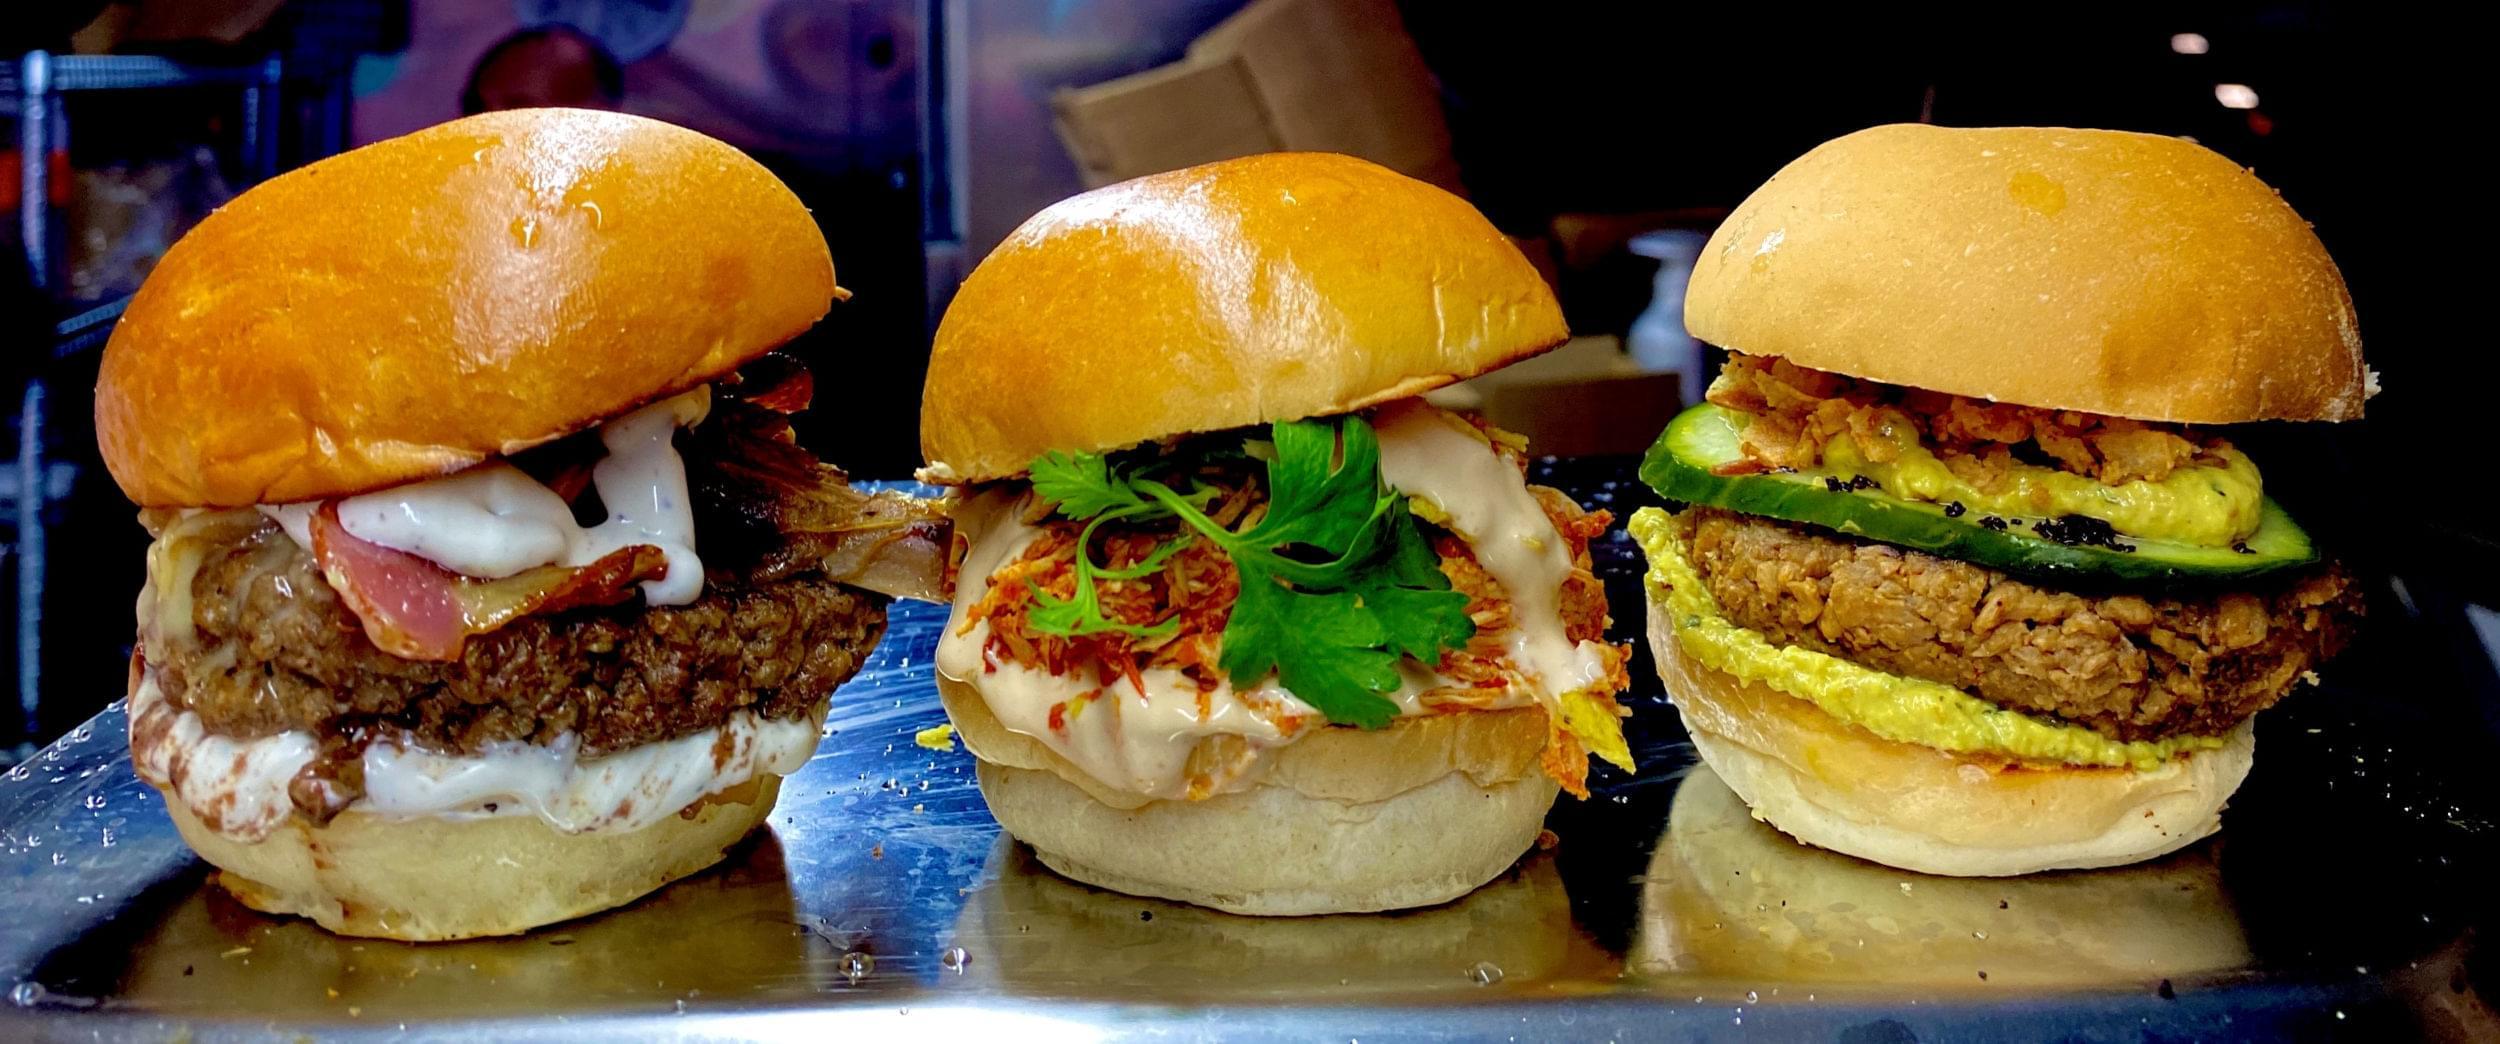 Three hamburgers